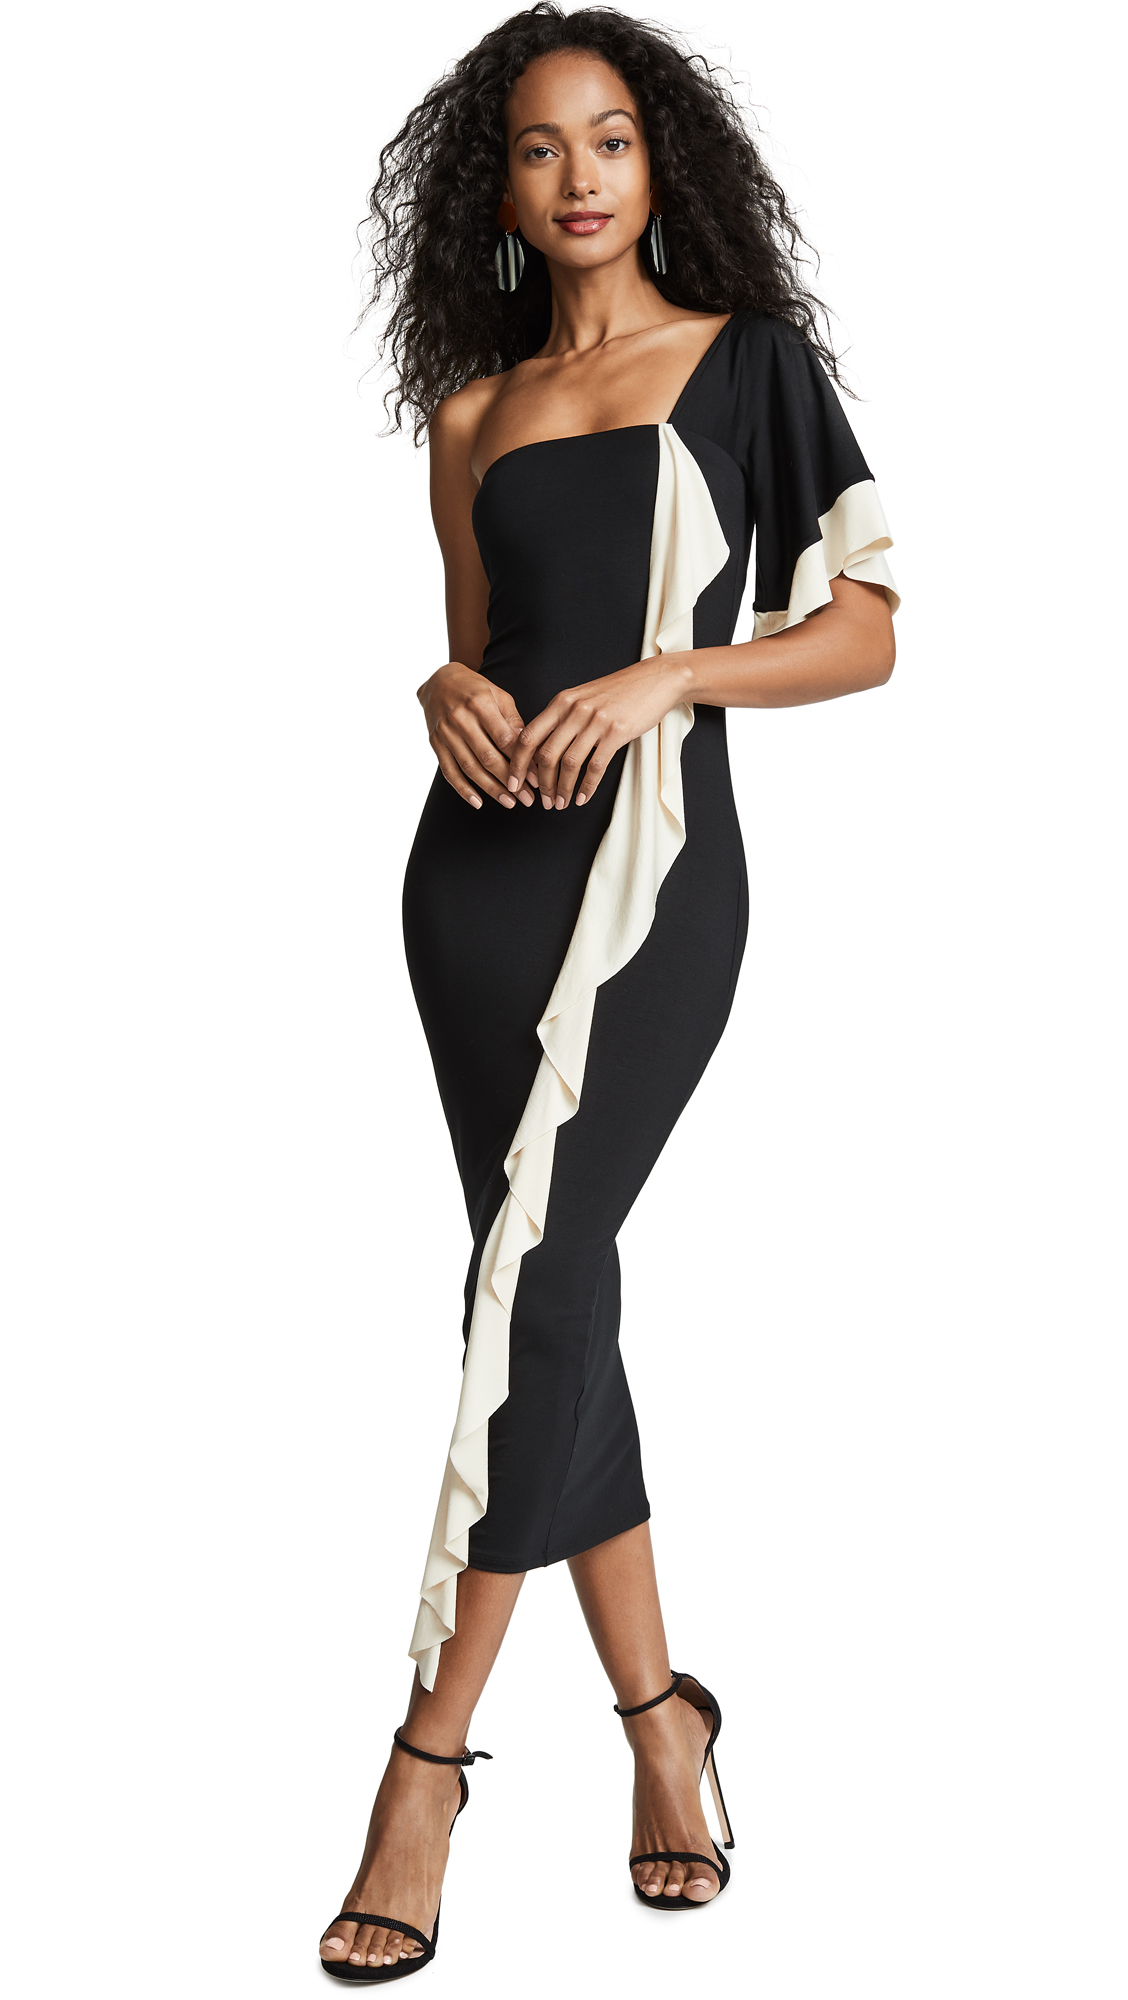 Rachel Pally Veronica Dress - Black/Cream Colorblock